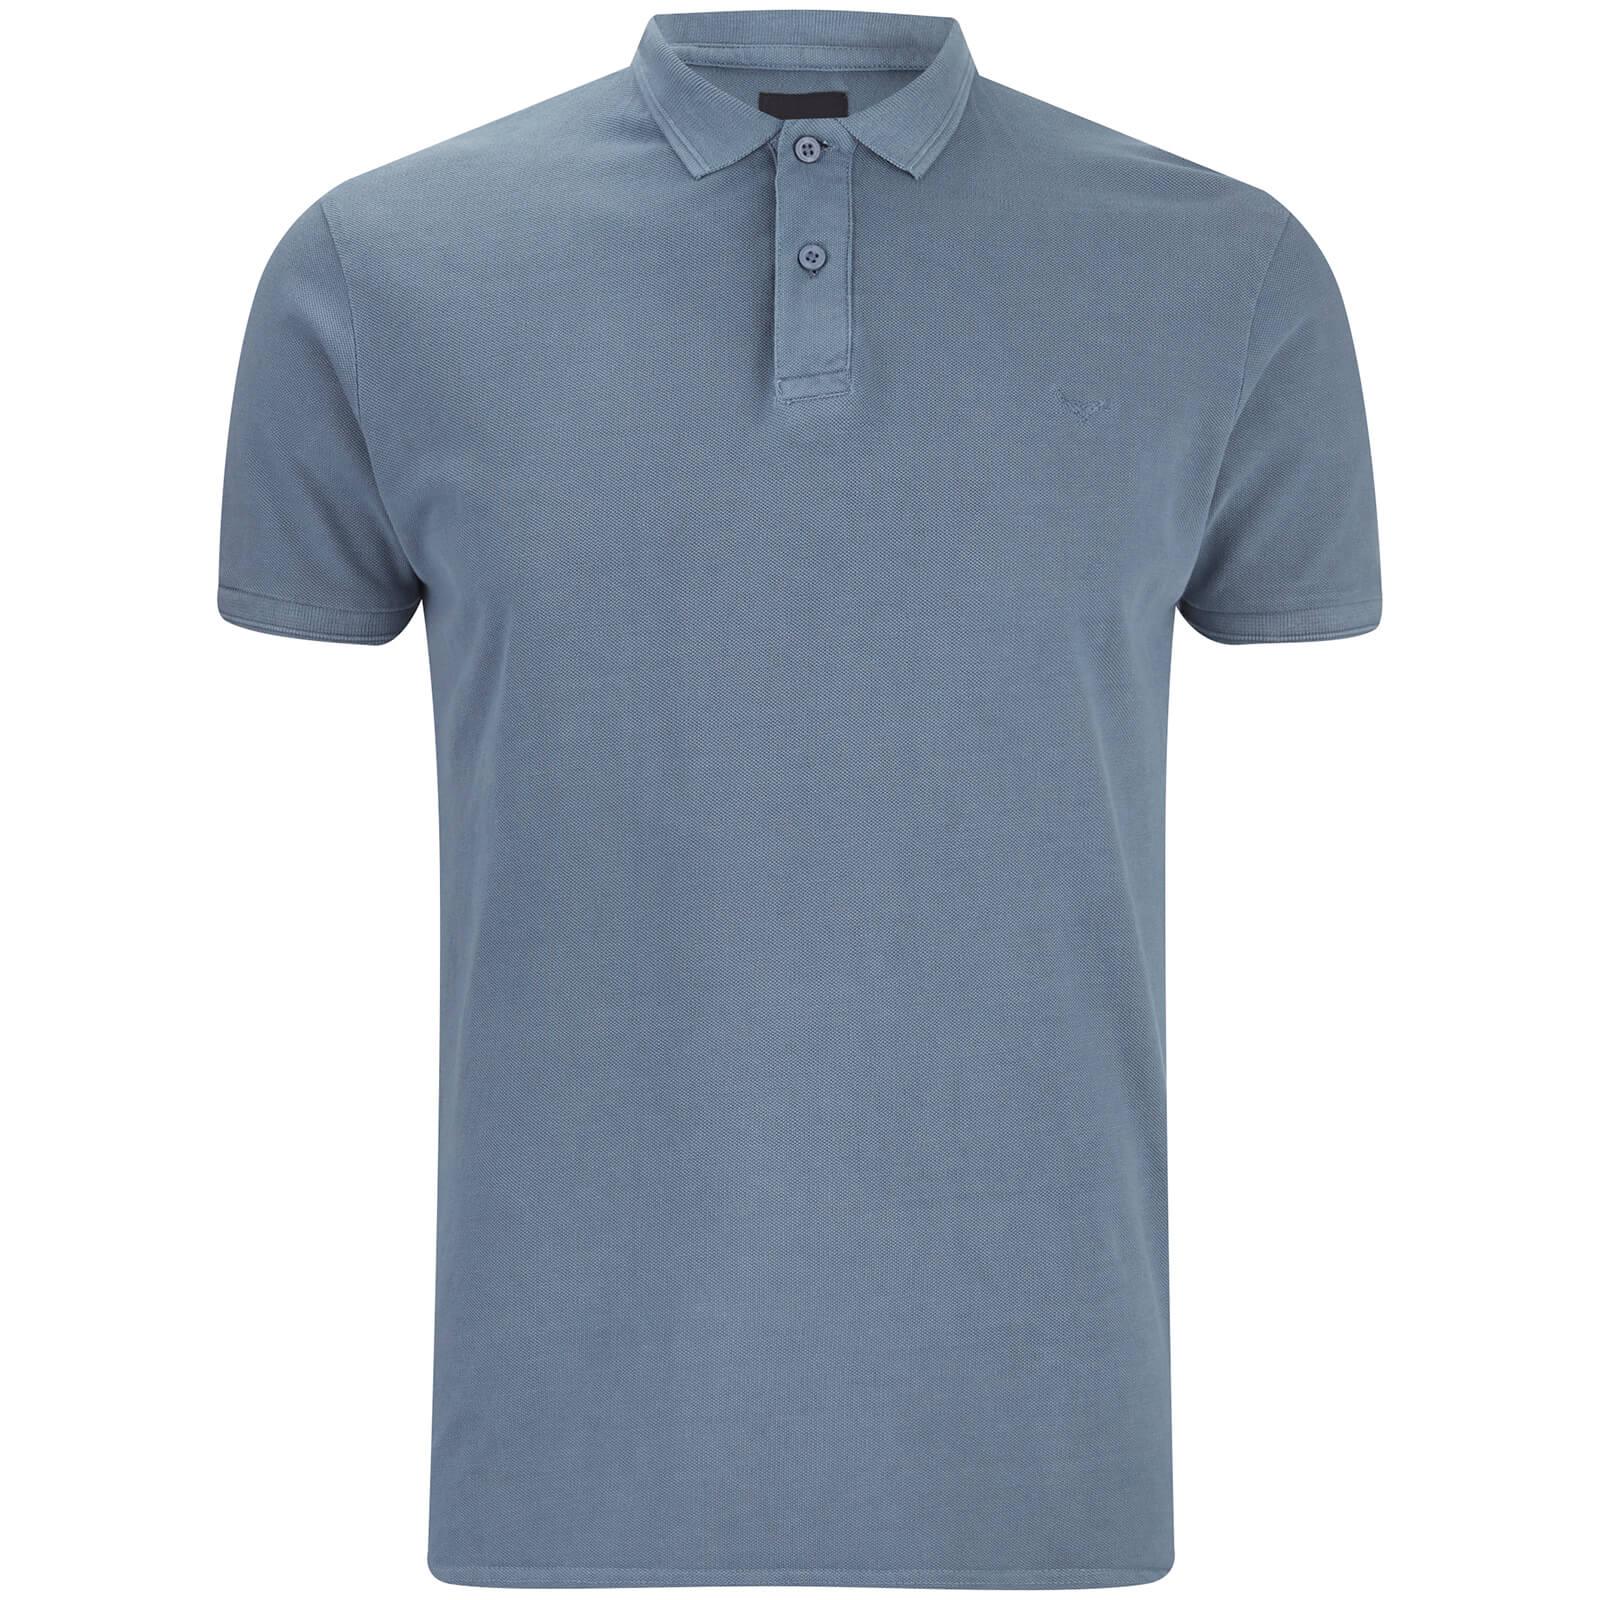 Threadbare Men s Kerman Polo Shirt - Denim Clothing  0633140d799